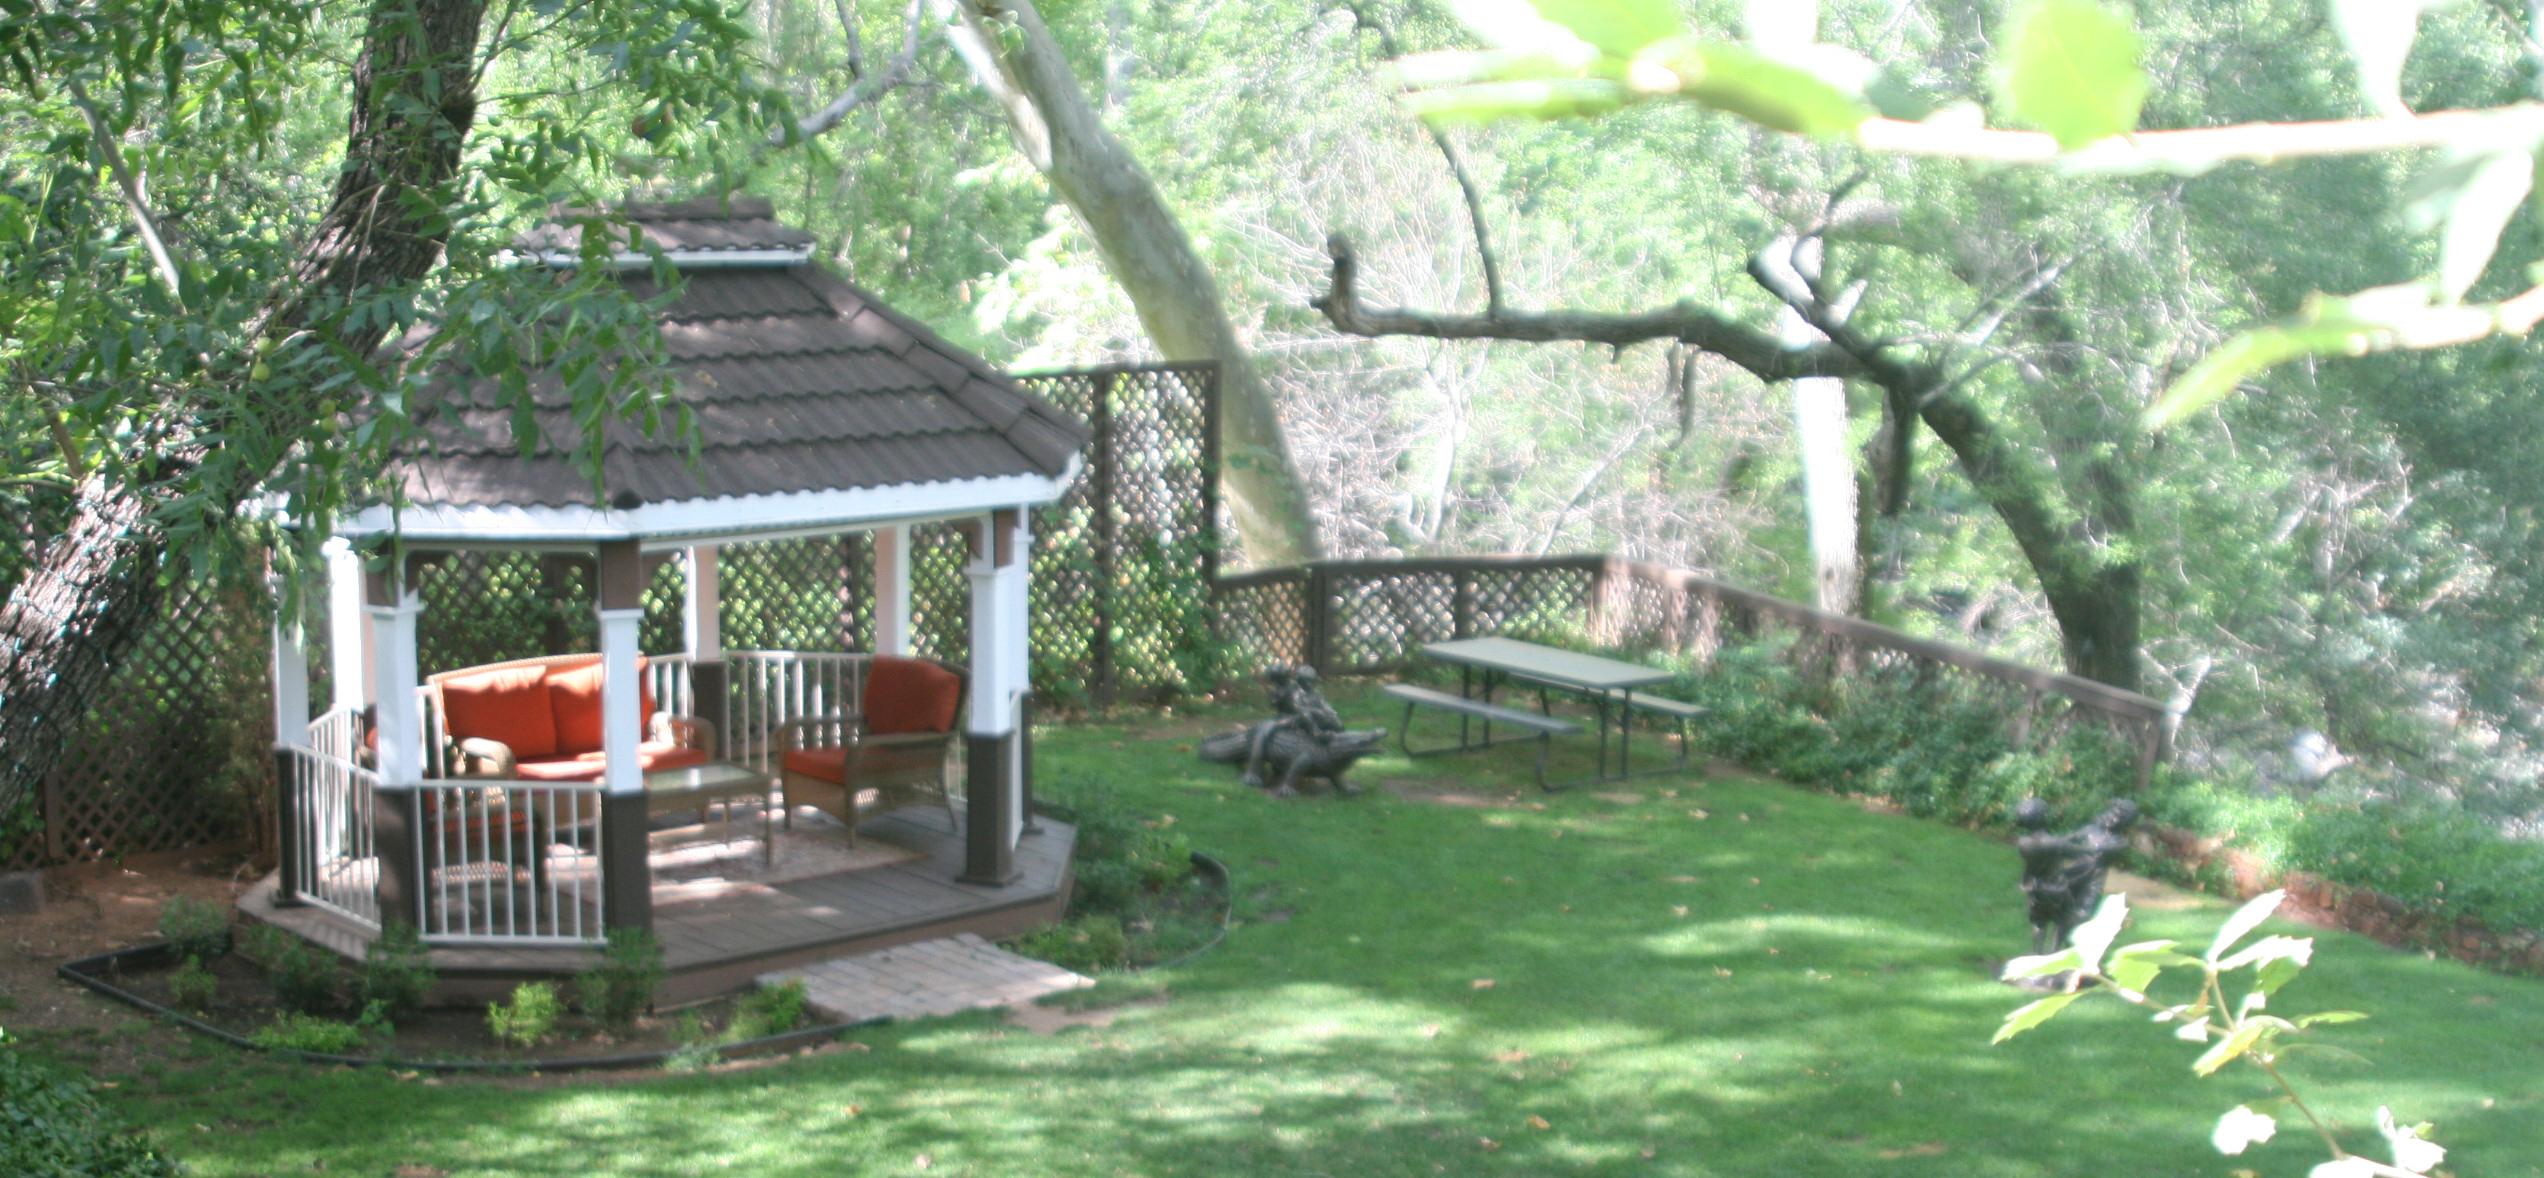 banner-Oak-Crek-Terrace-Sedona-Lodging-And_Accomodations-Cabins-On-Creek41